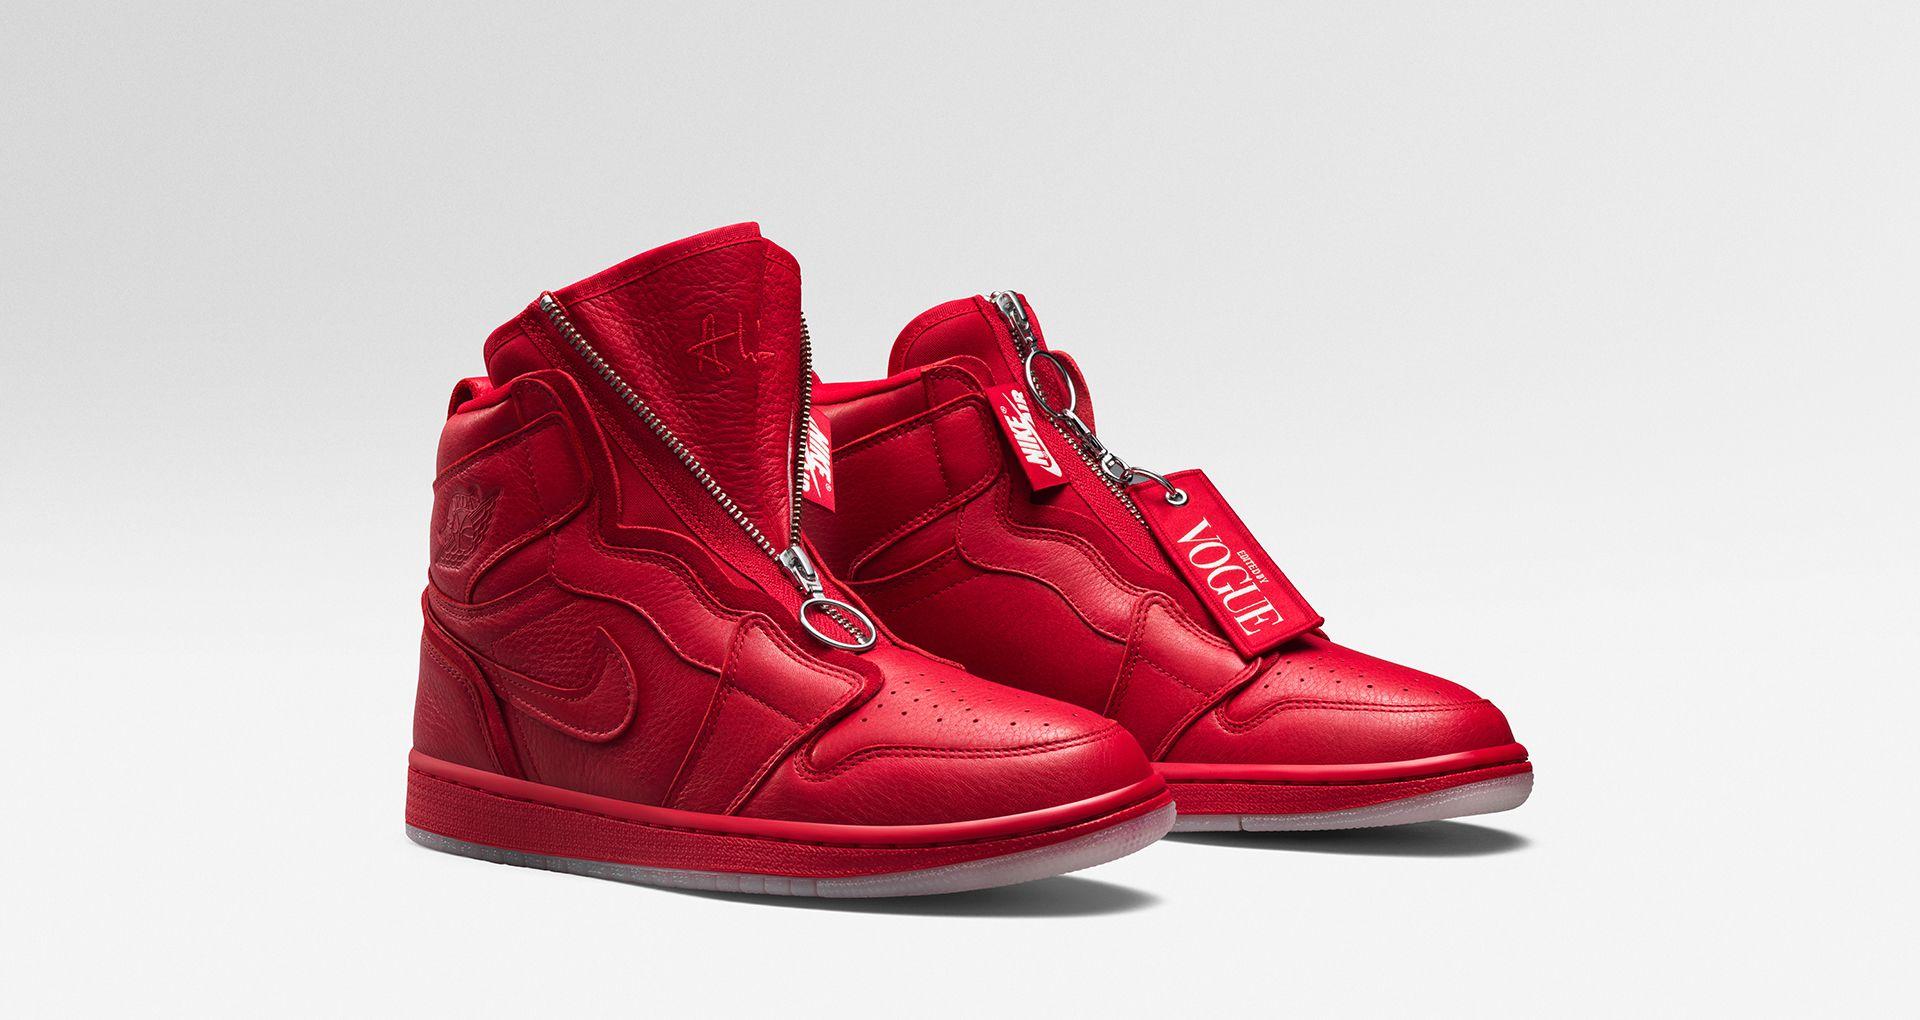 pretty nice 145c9 916d2 Women's Air Jordan I High Zip AWOK 'University Red' Release ...